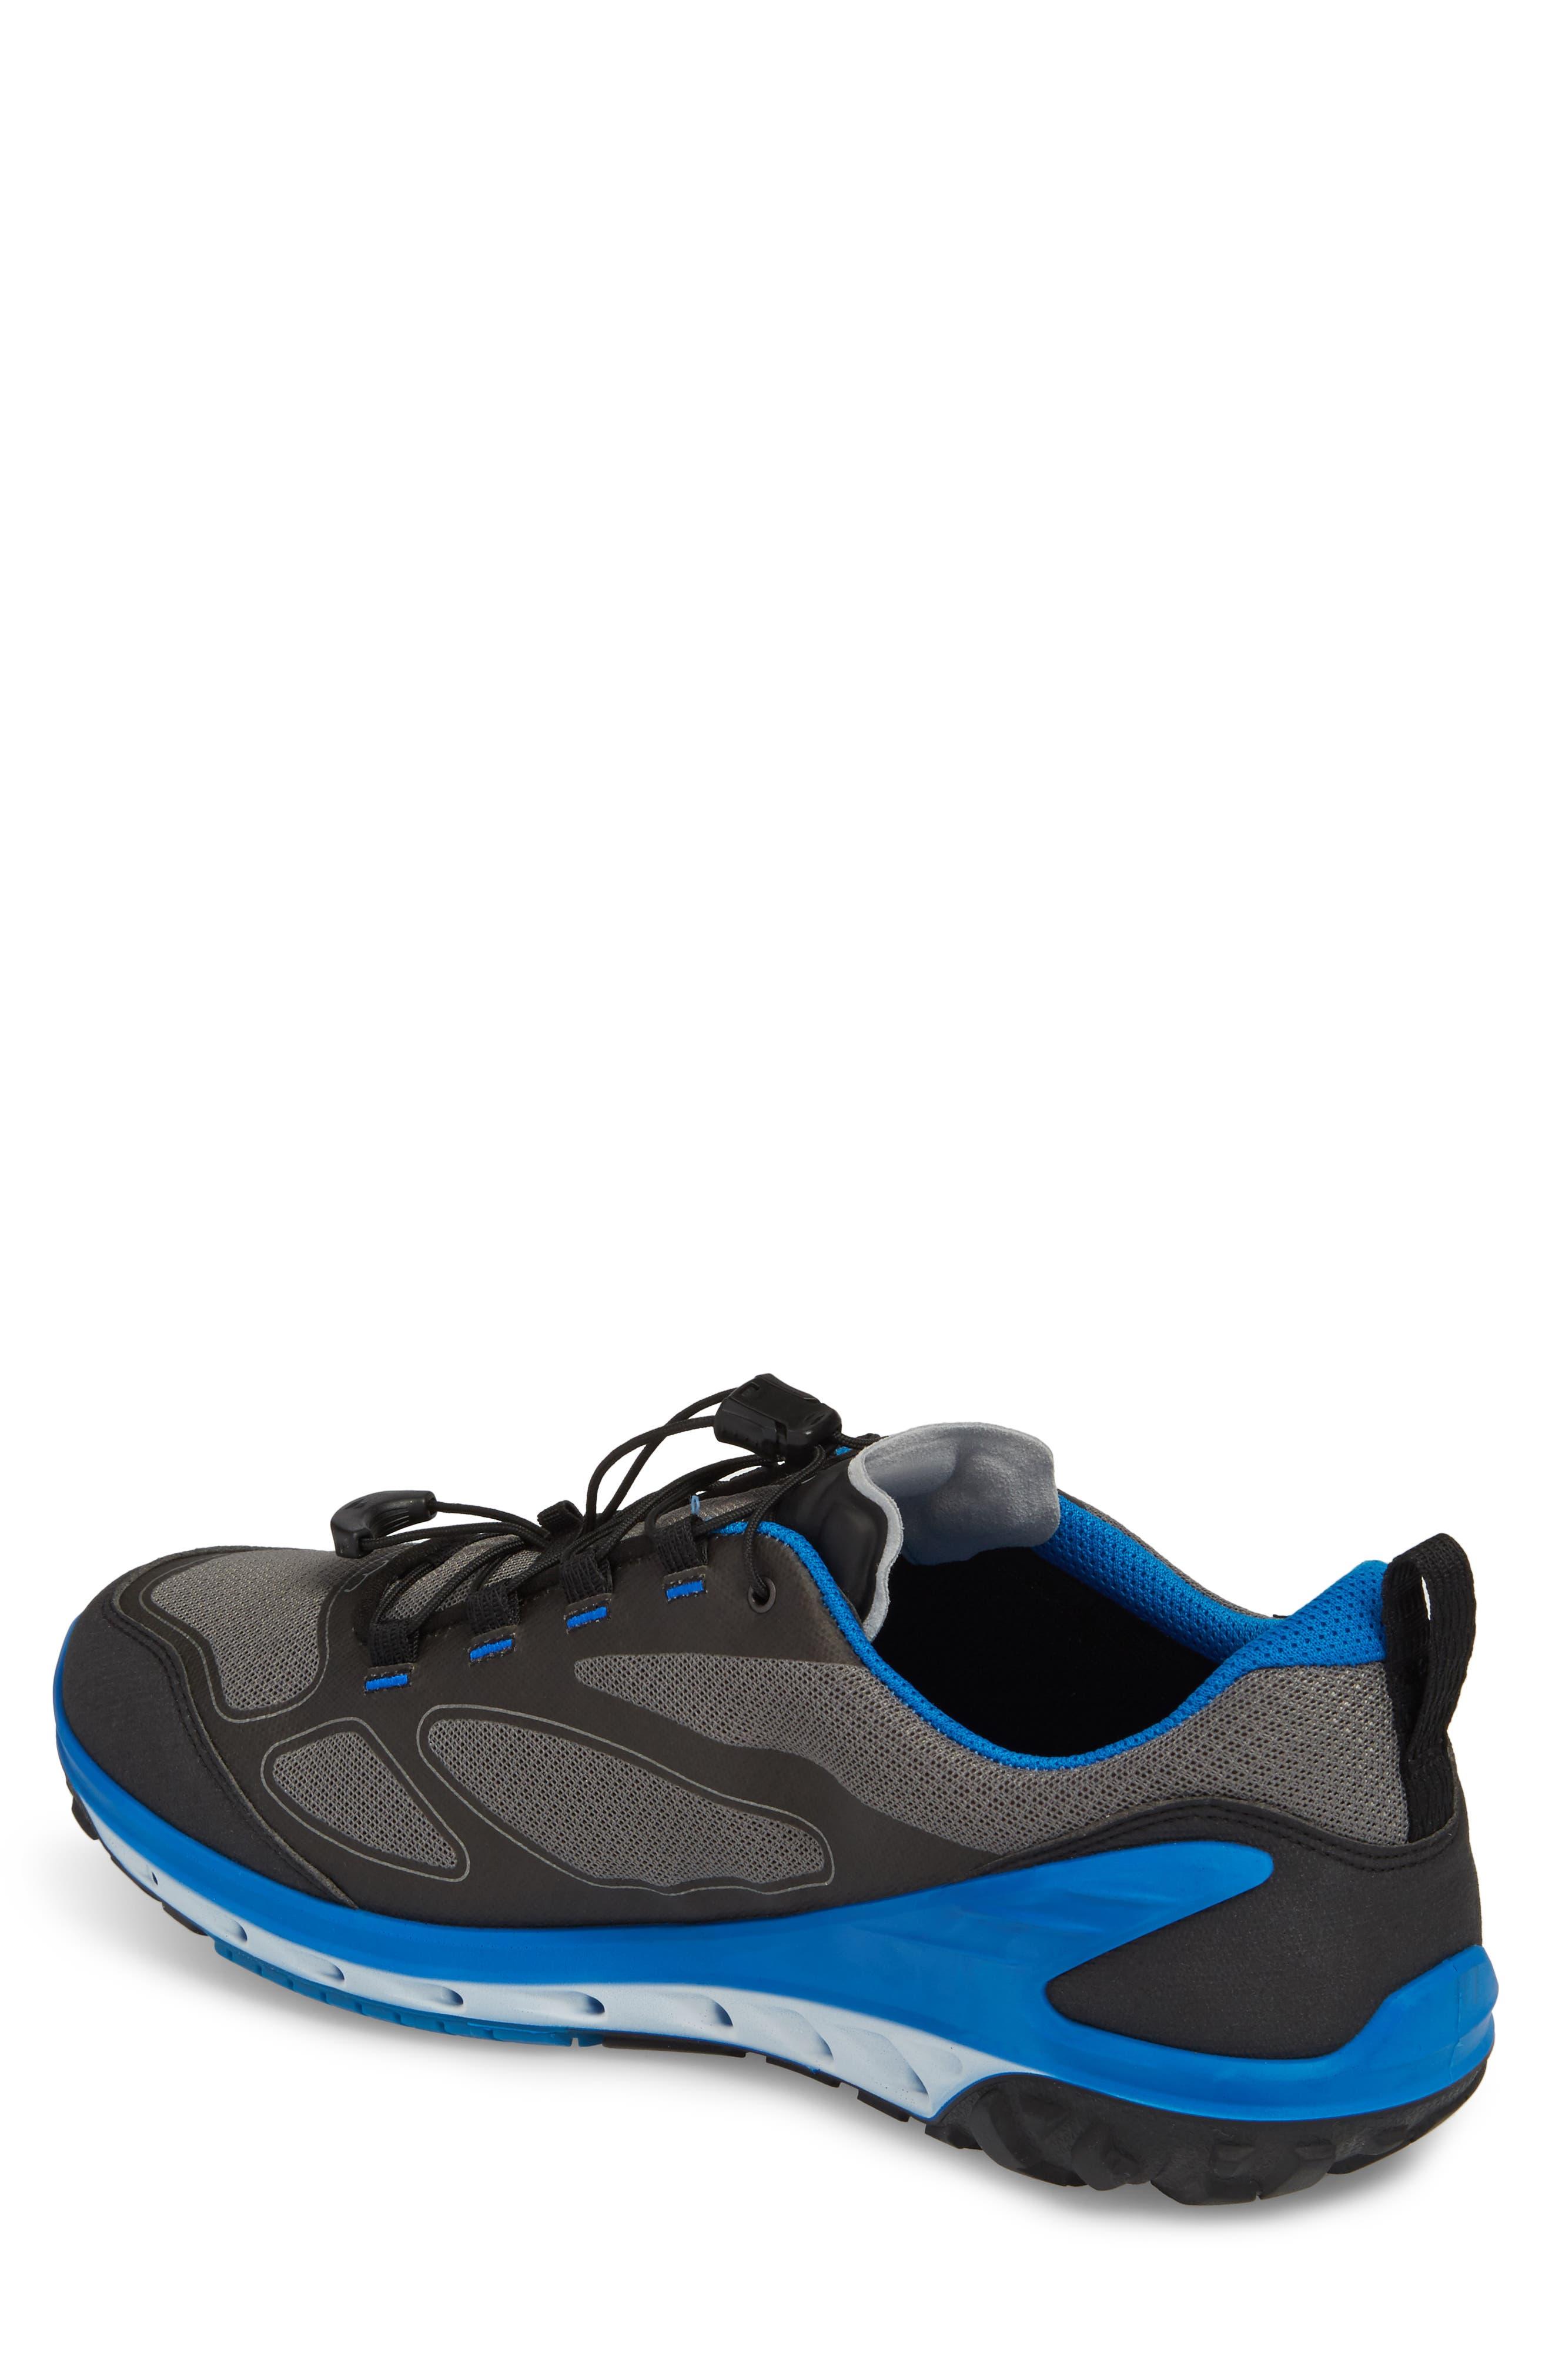 BIOM Venture GTX Sneaker,                             Alternate thumbnail 2, color,                             062